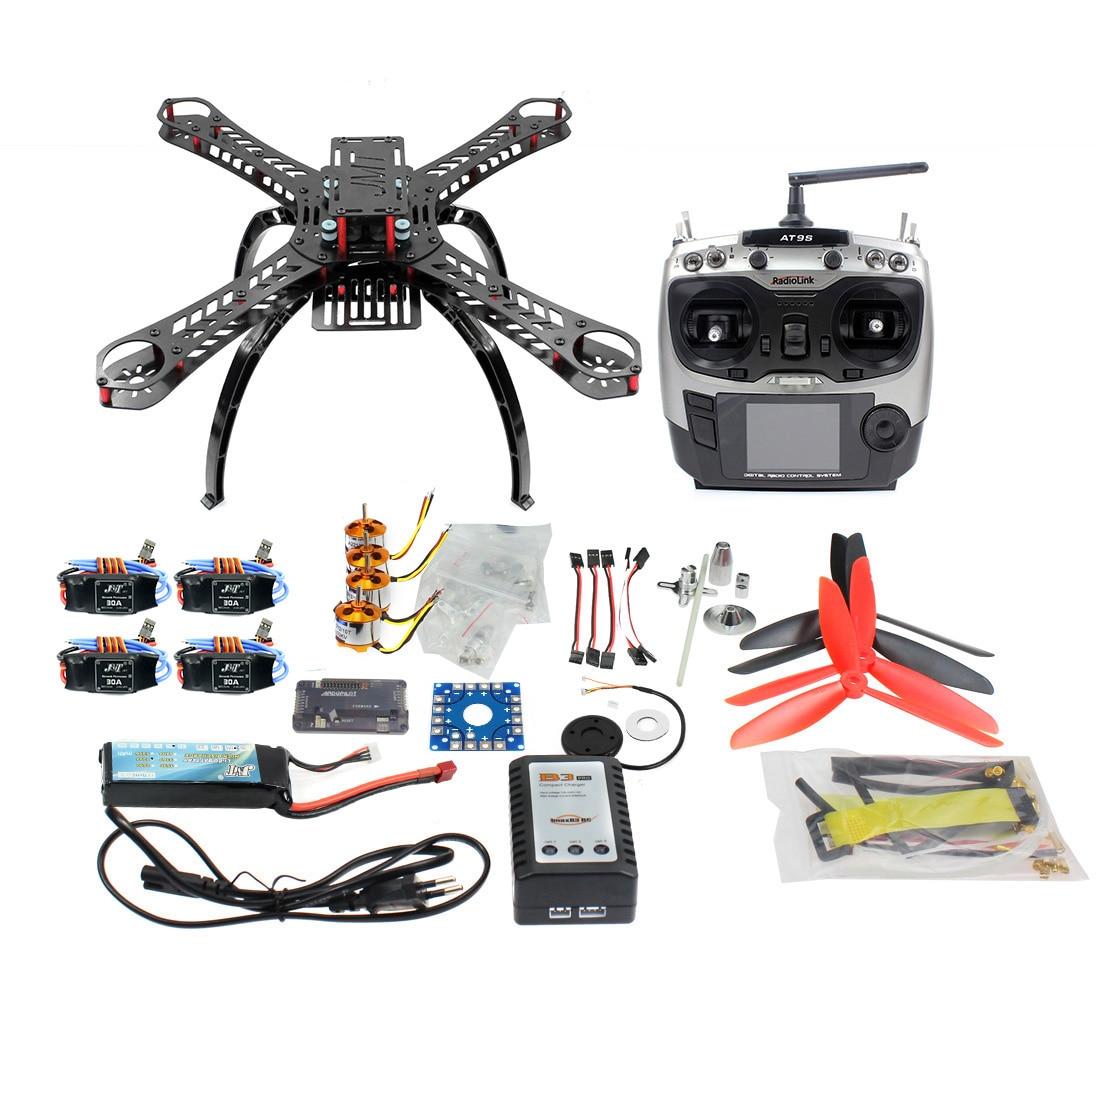 DIY RC Fiberglass Frame Multicopter Full Kit DIY GPS Drone FPV Radiolink AT9 Transmitter APM2.8 1400KV Motor 30A ESC F14891 C